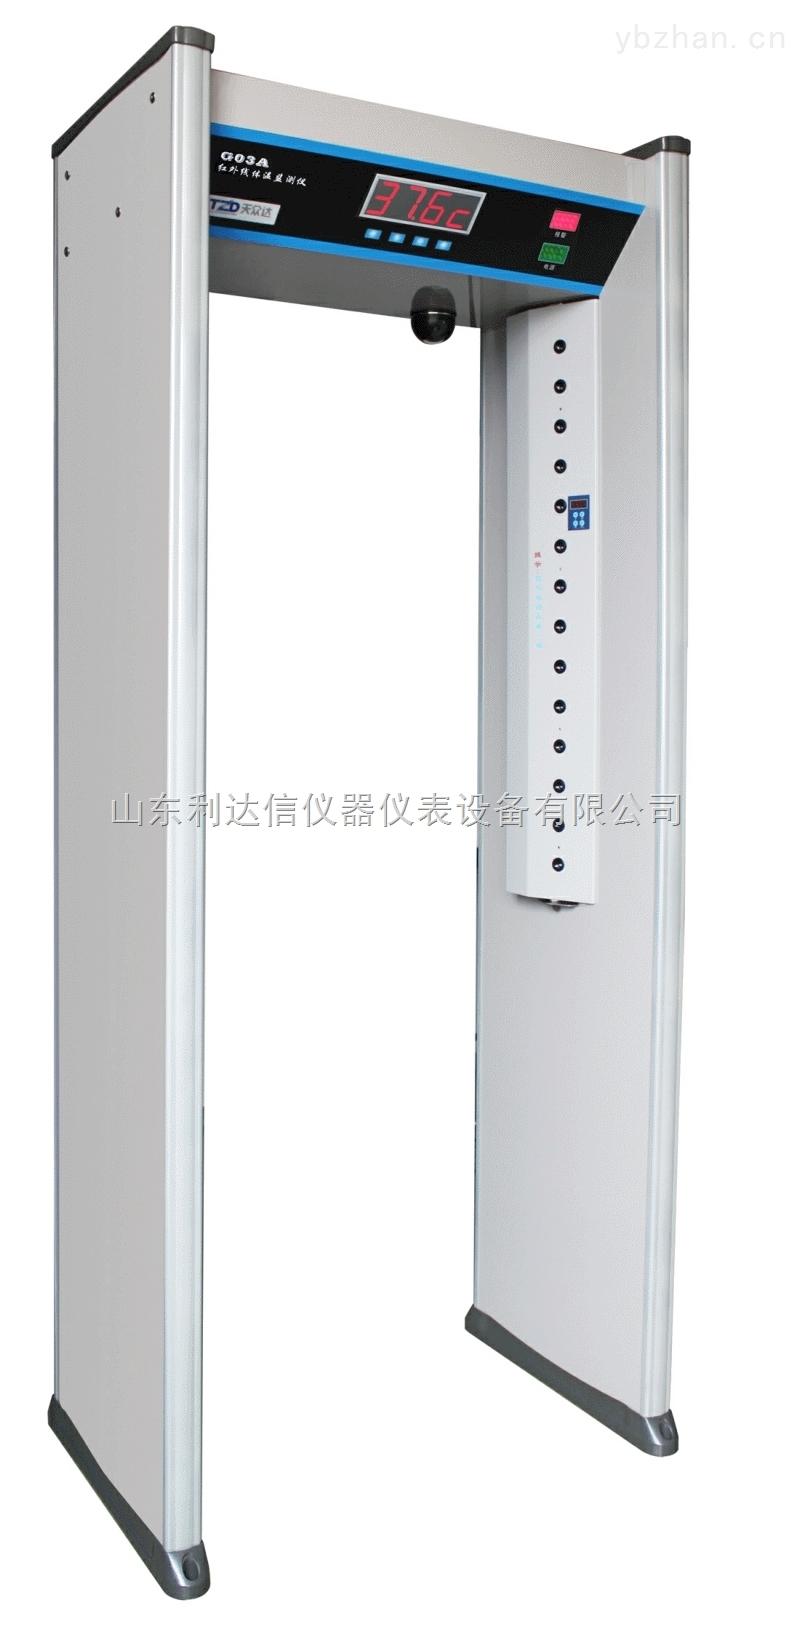 LDX-TZD-CW-G03A-C-门式多探头测温仪/多探头红外线体温监测仪/门式红外测温仪/在线红外测温仪